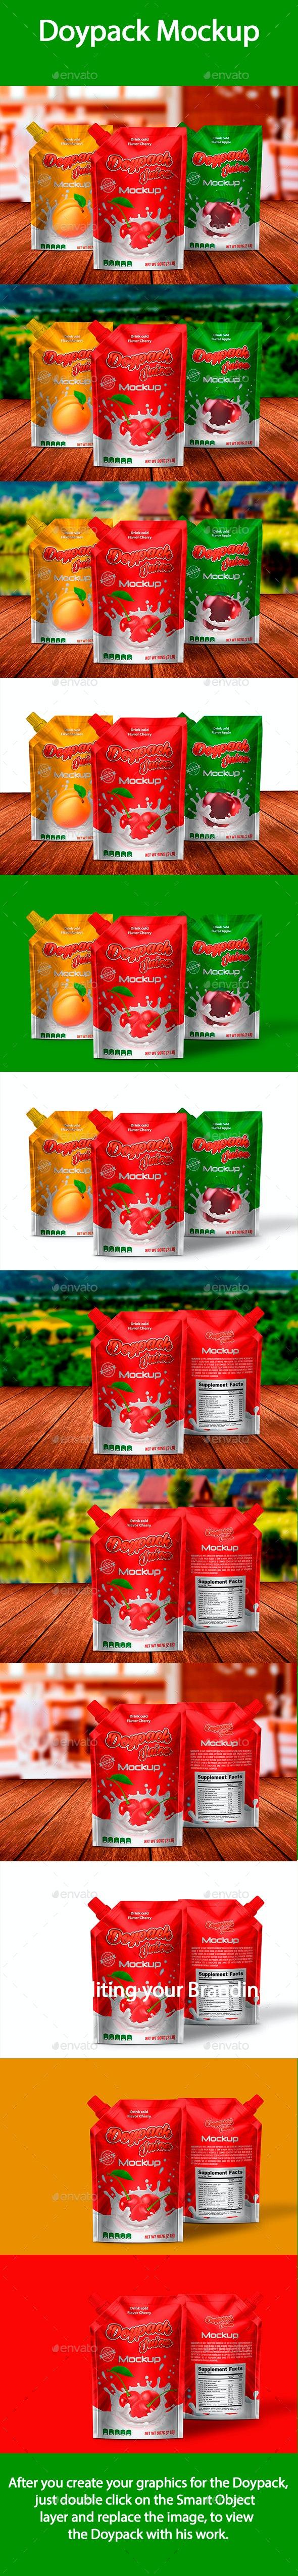 Doypack Mockup - Food and Drink Packaging